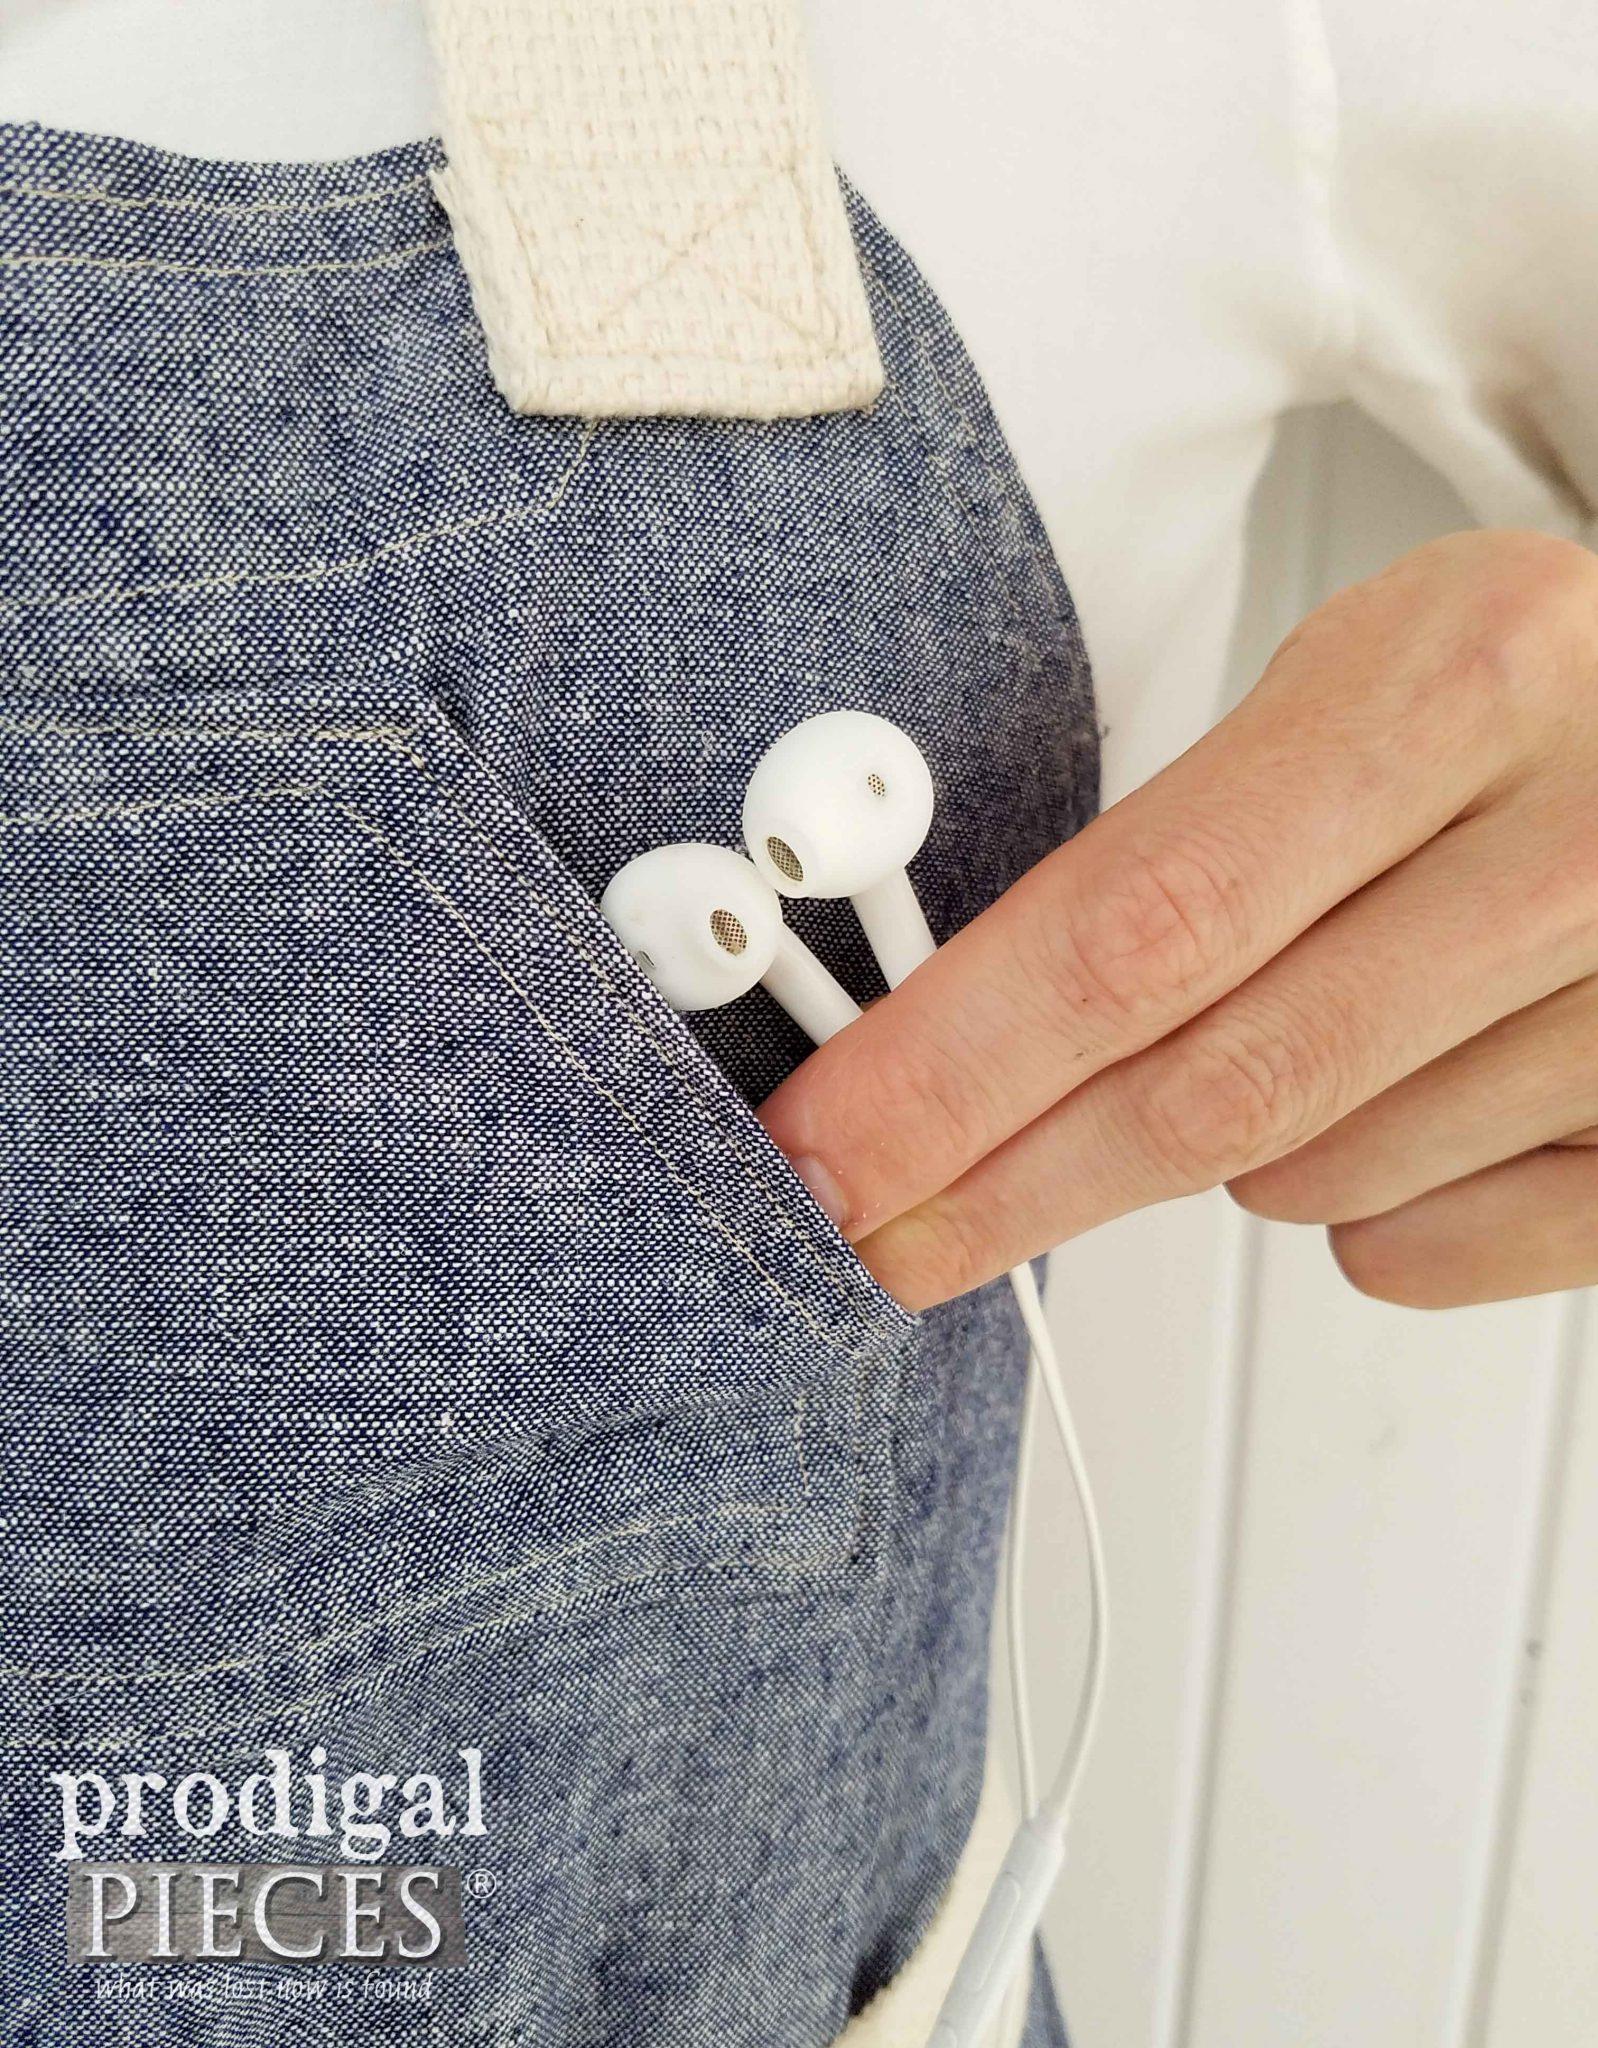 Bib Pocket on Apron by Prodigal Pieces   prodigalpieces.com